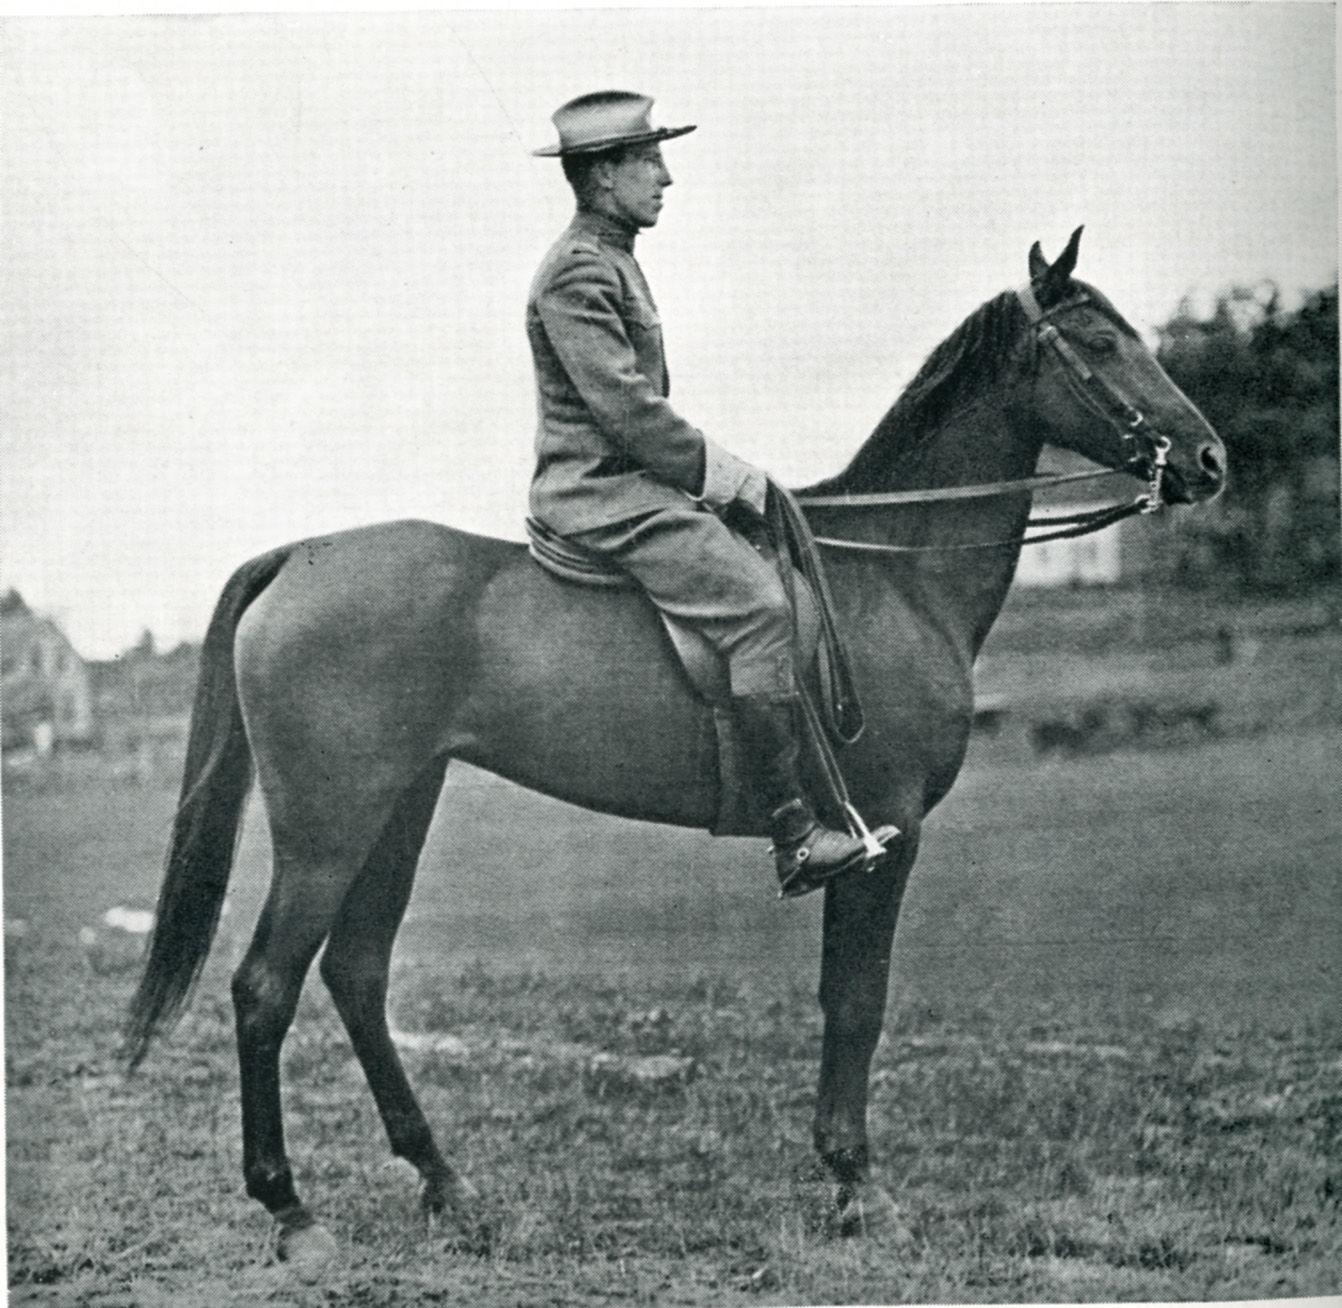 Morgan wins 1913 endurance race